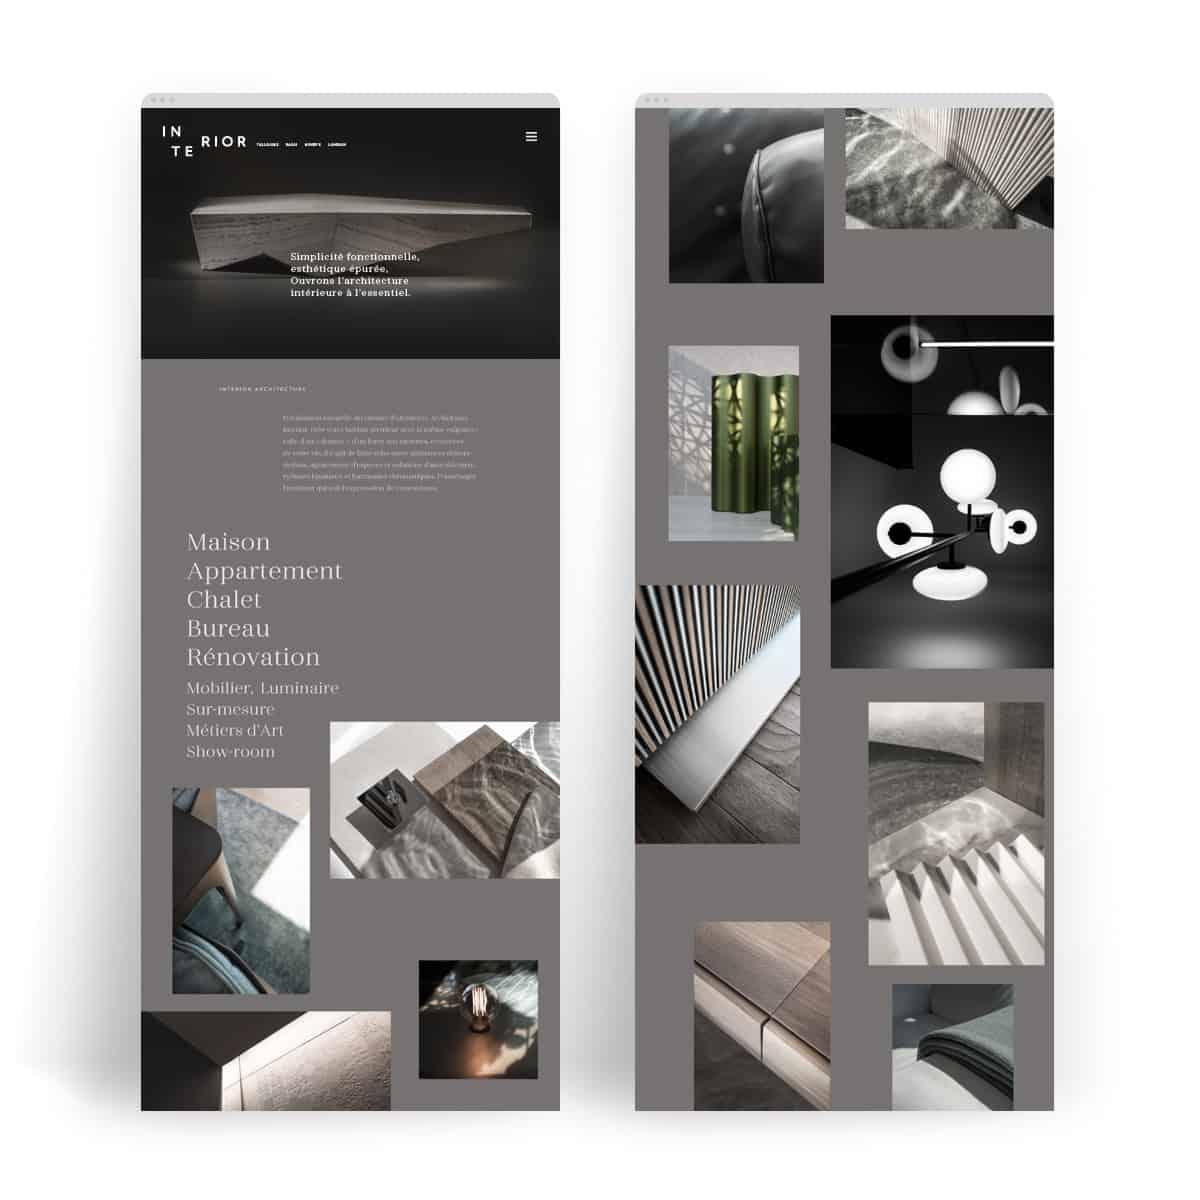 Webdesign, graphiste. BLUE1310 agence de communication web marketing digital à Annecy